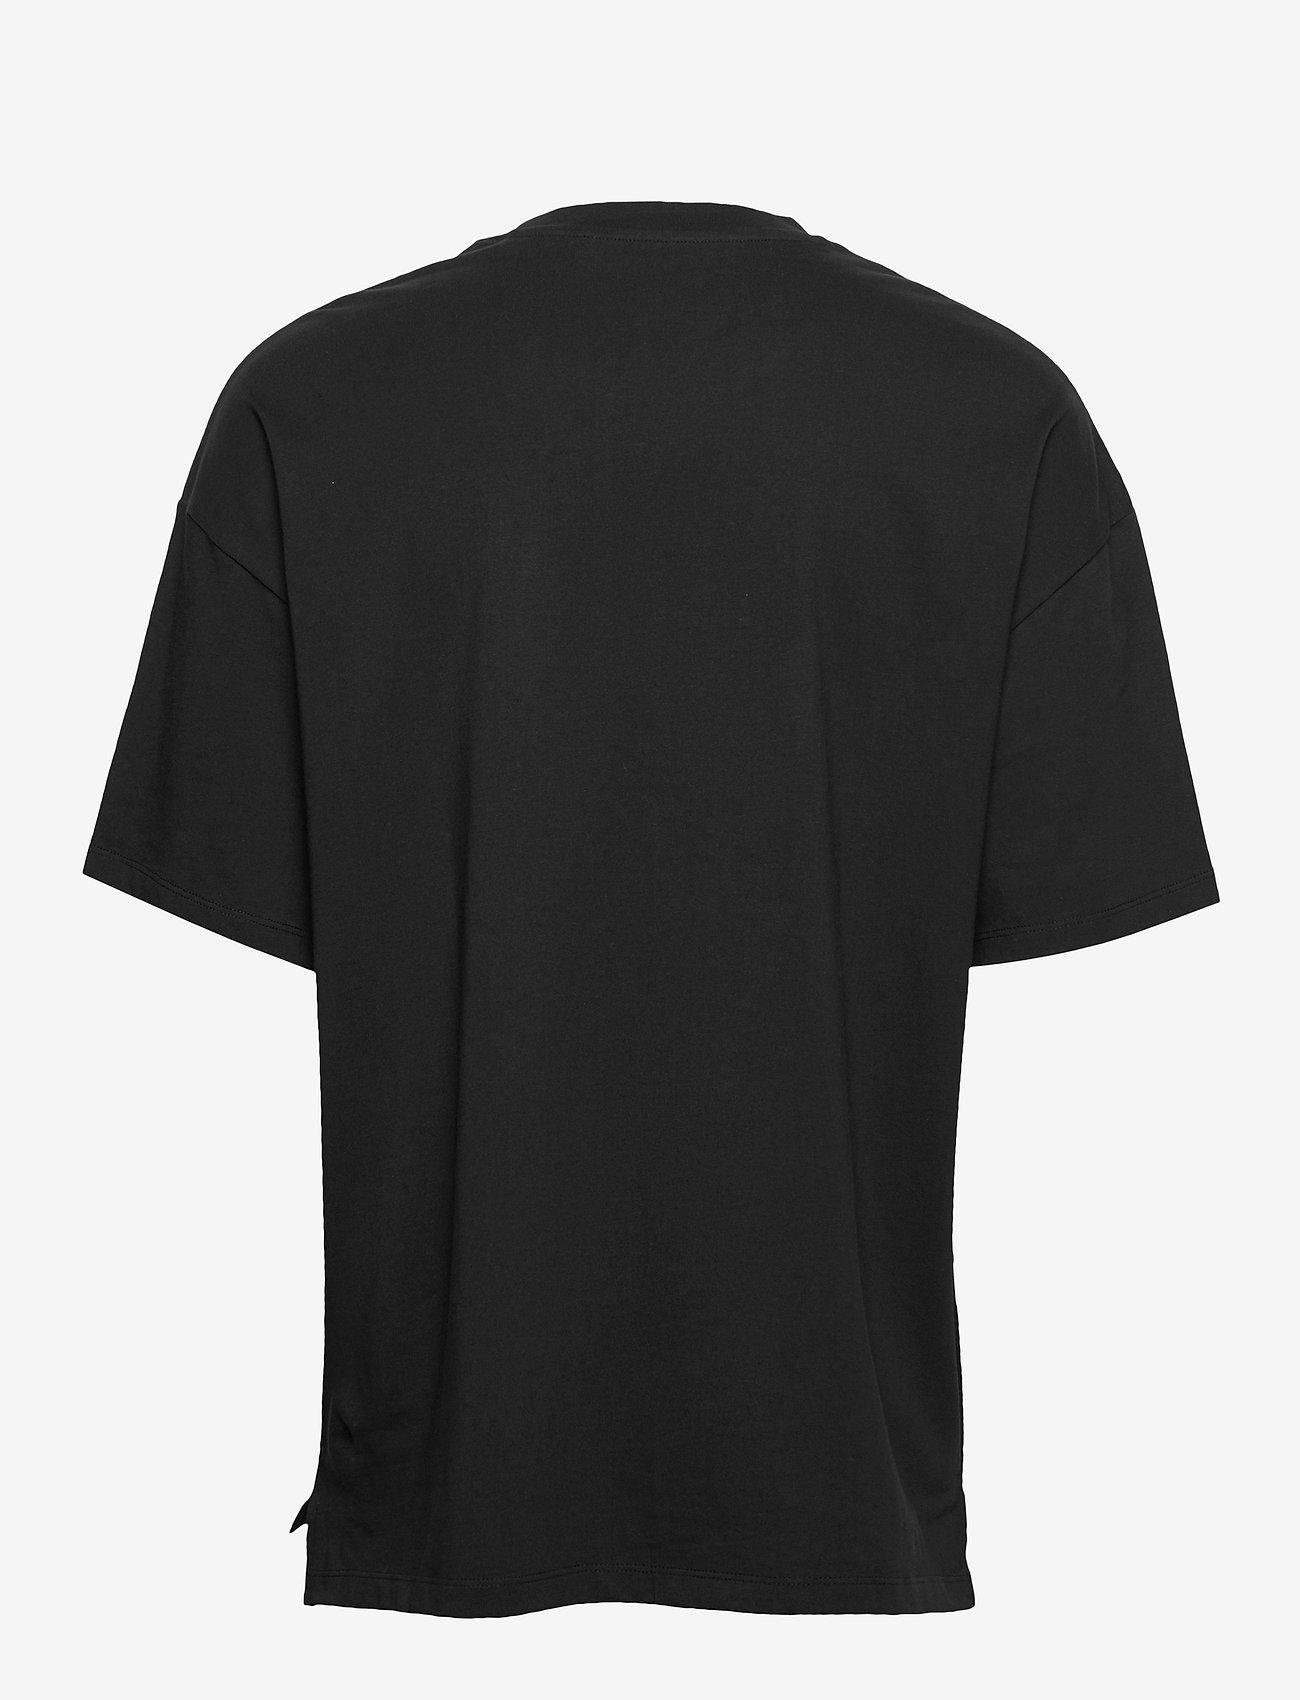 EDC by Esprit - T-Shirts - basic t-shirts - black - 1